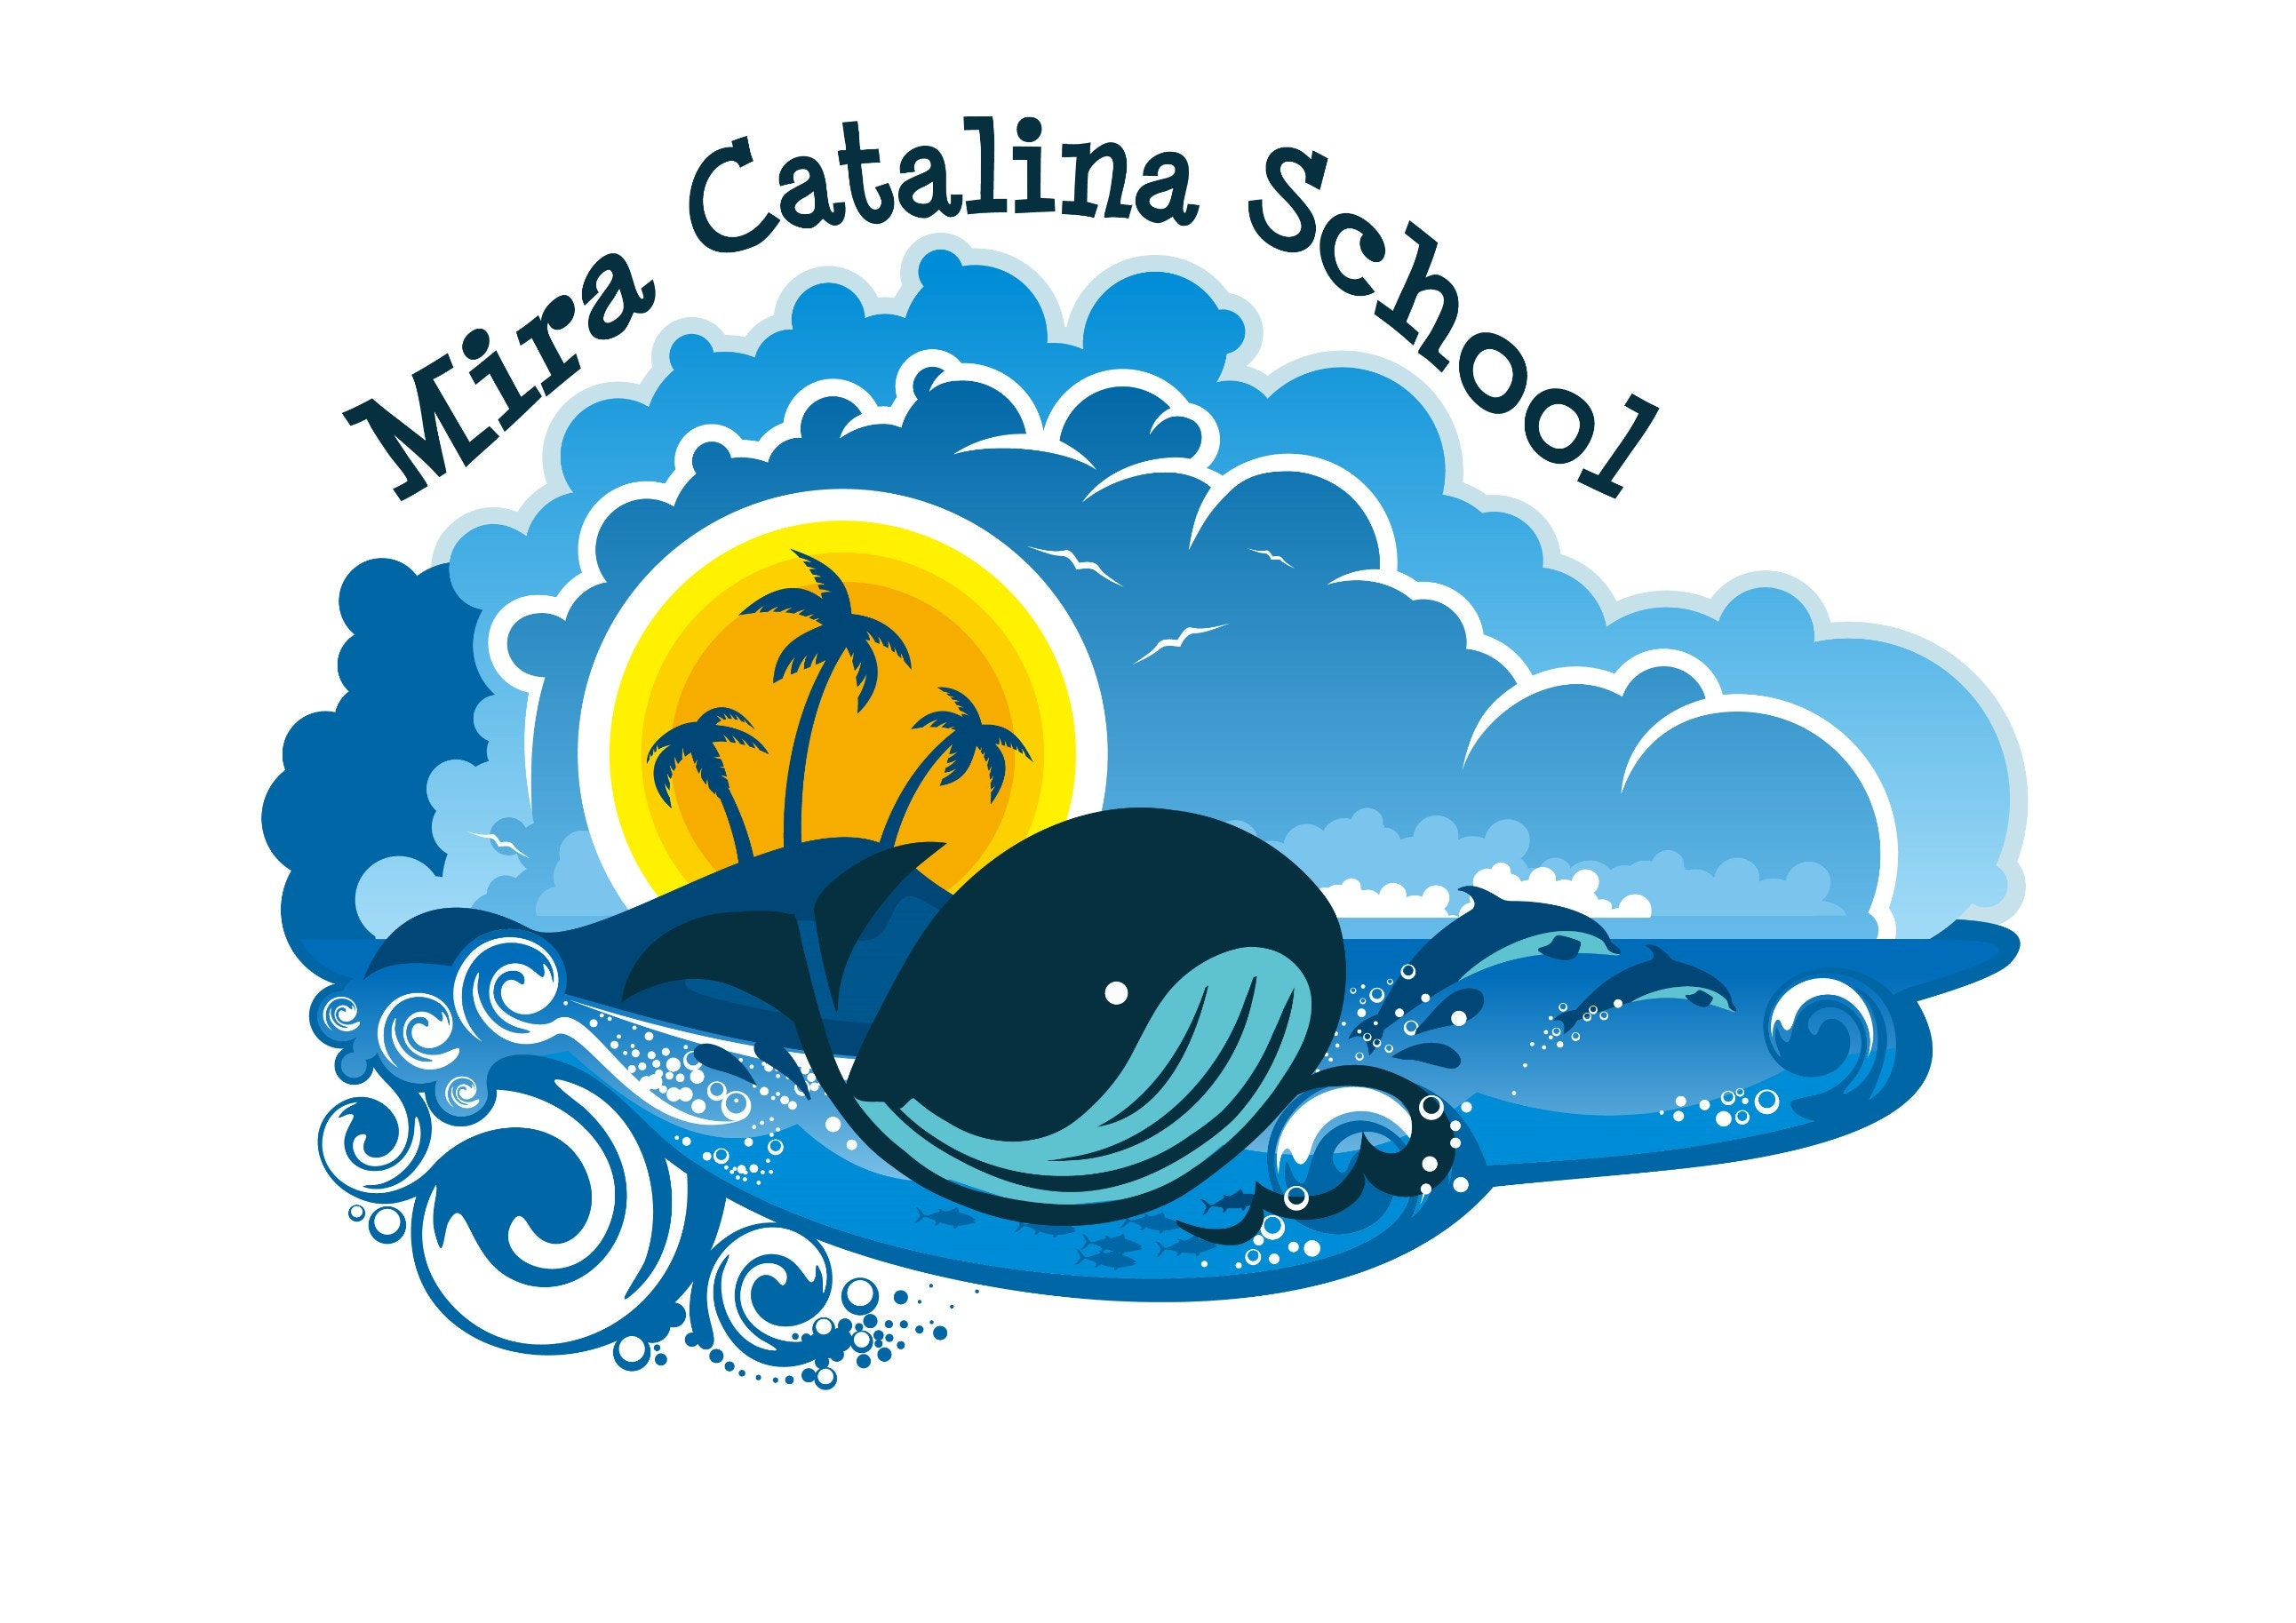 Mira Catalina Elementary School